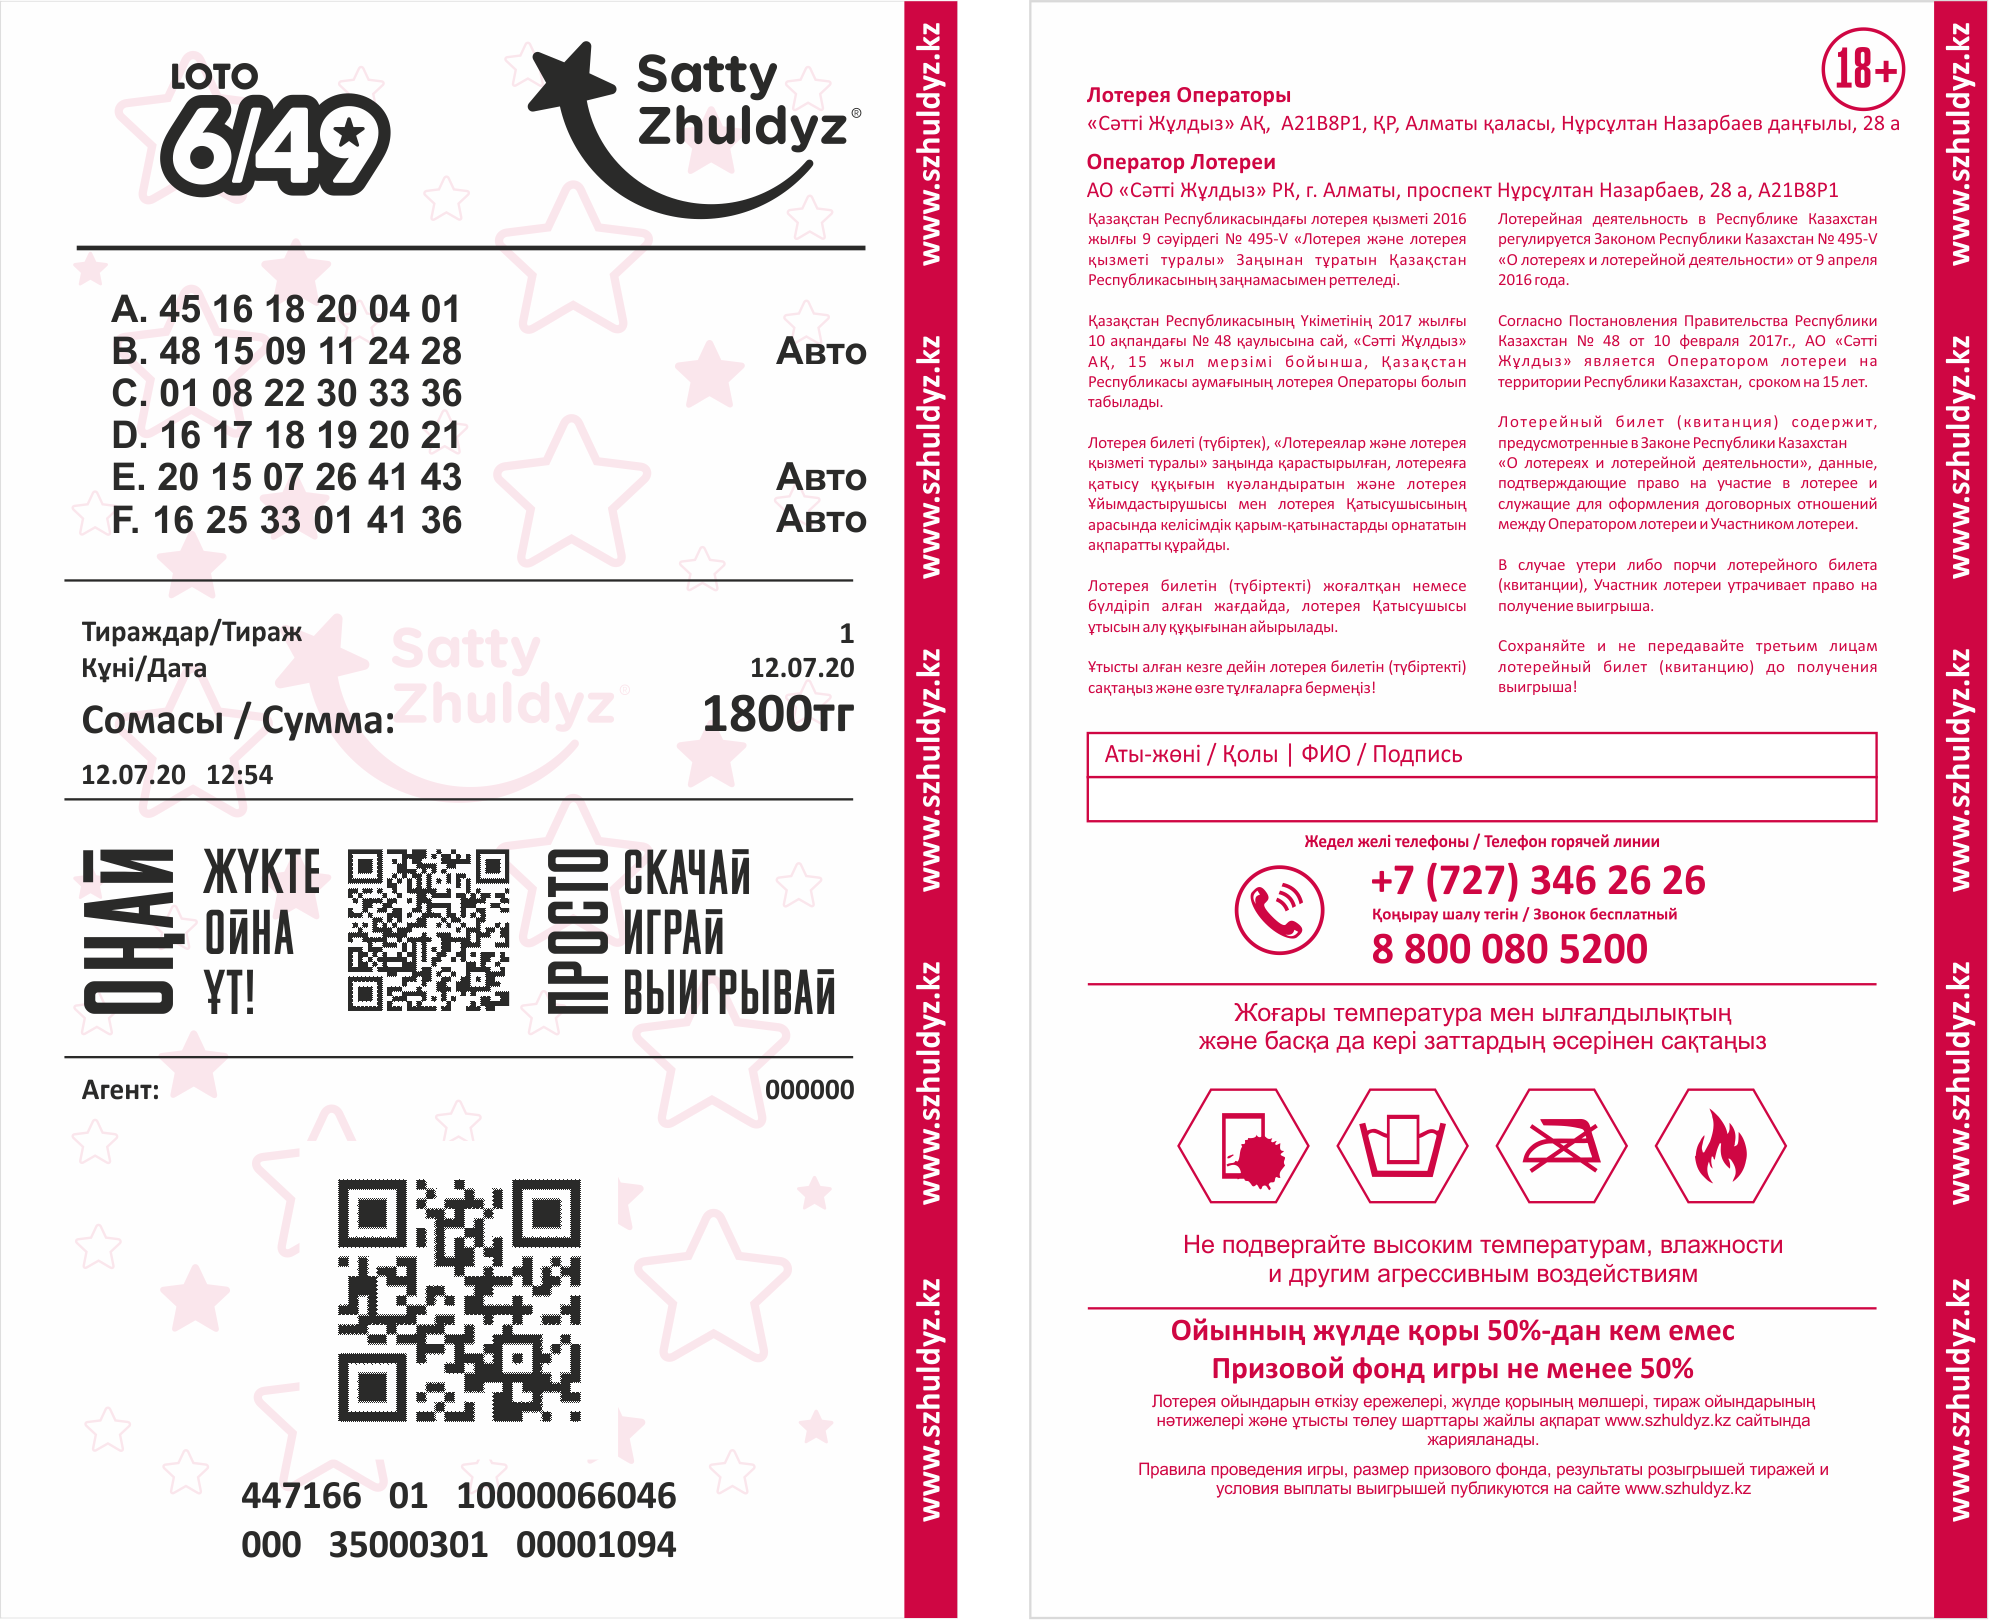 Lotto 6aus49 segítség & GYIK